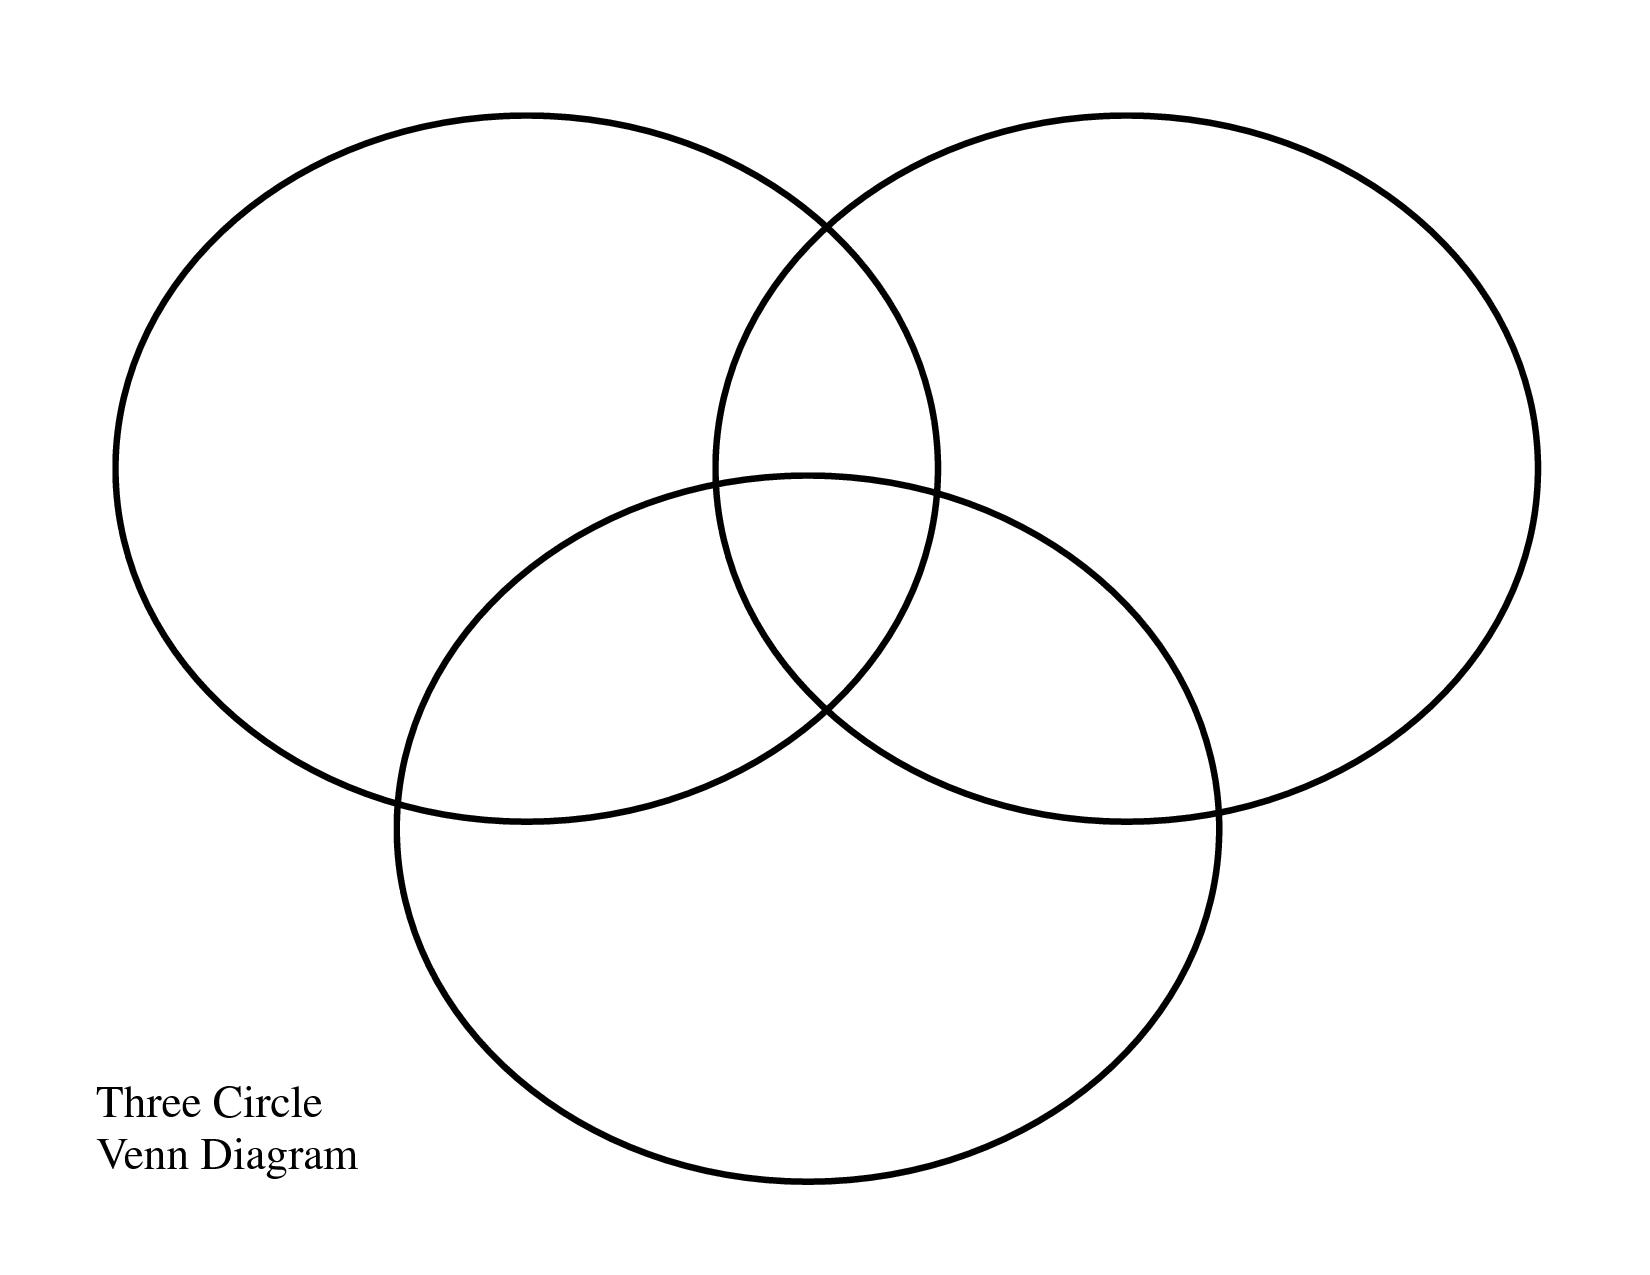 Venn Diagram Maker 3 Circle Venn Diagram Generator Erhayasamayolver